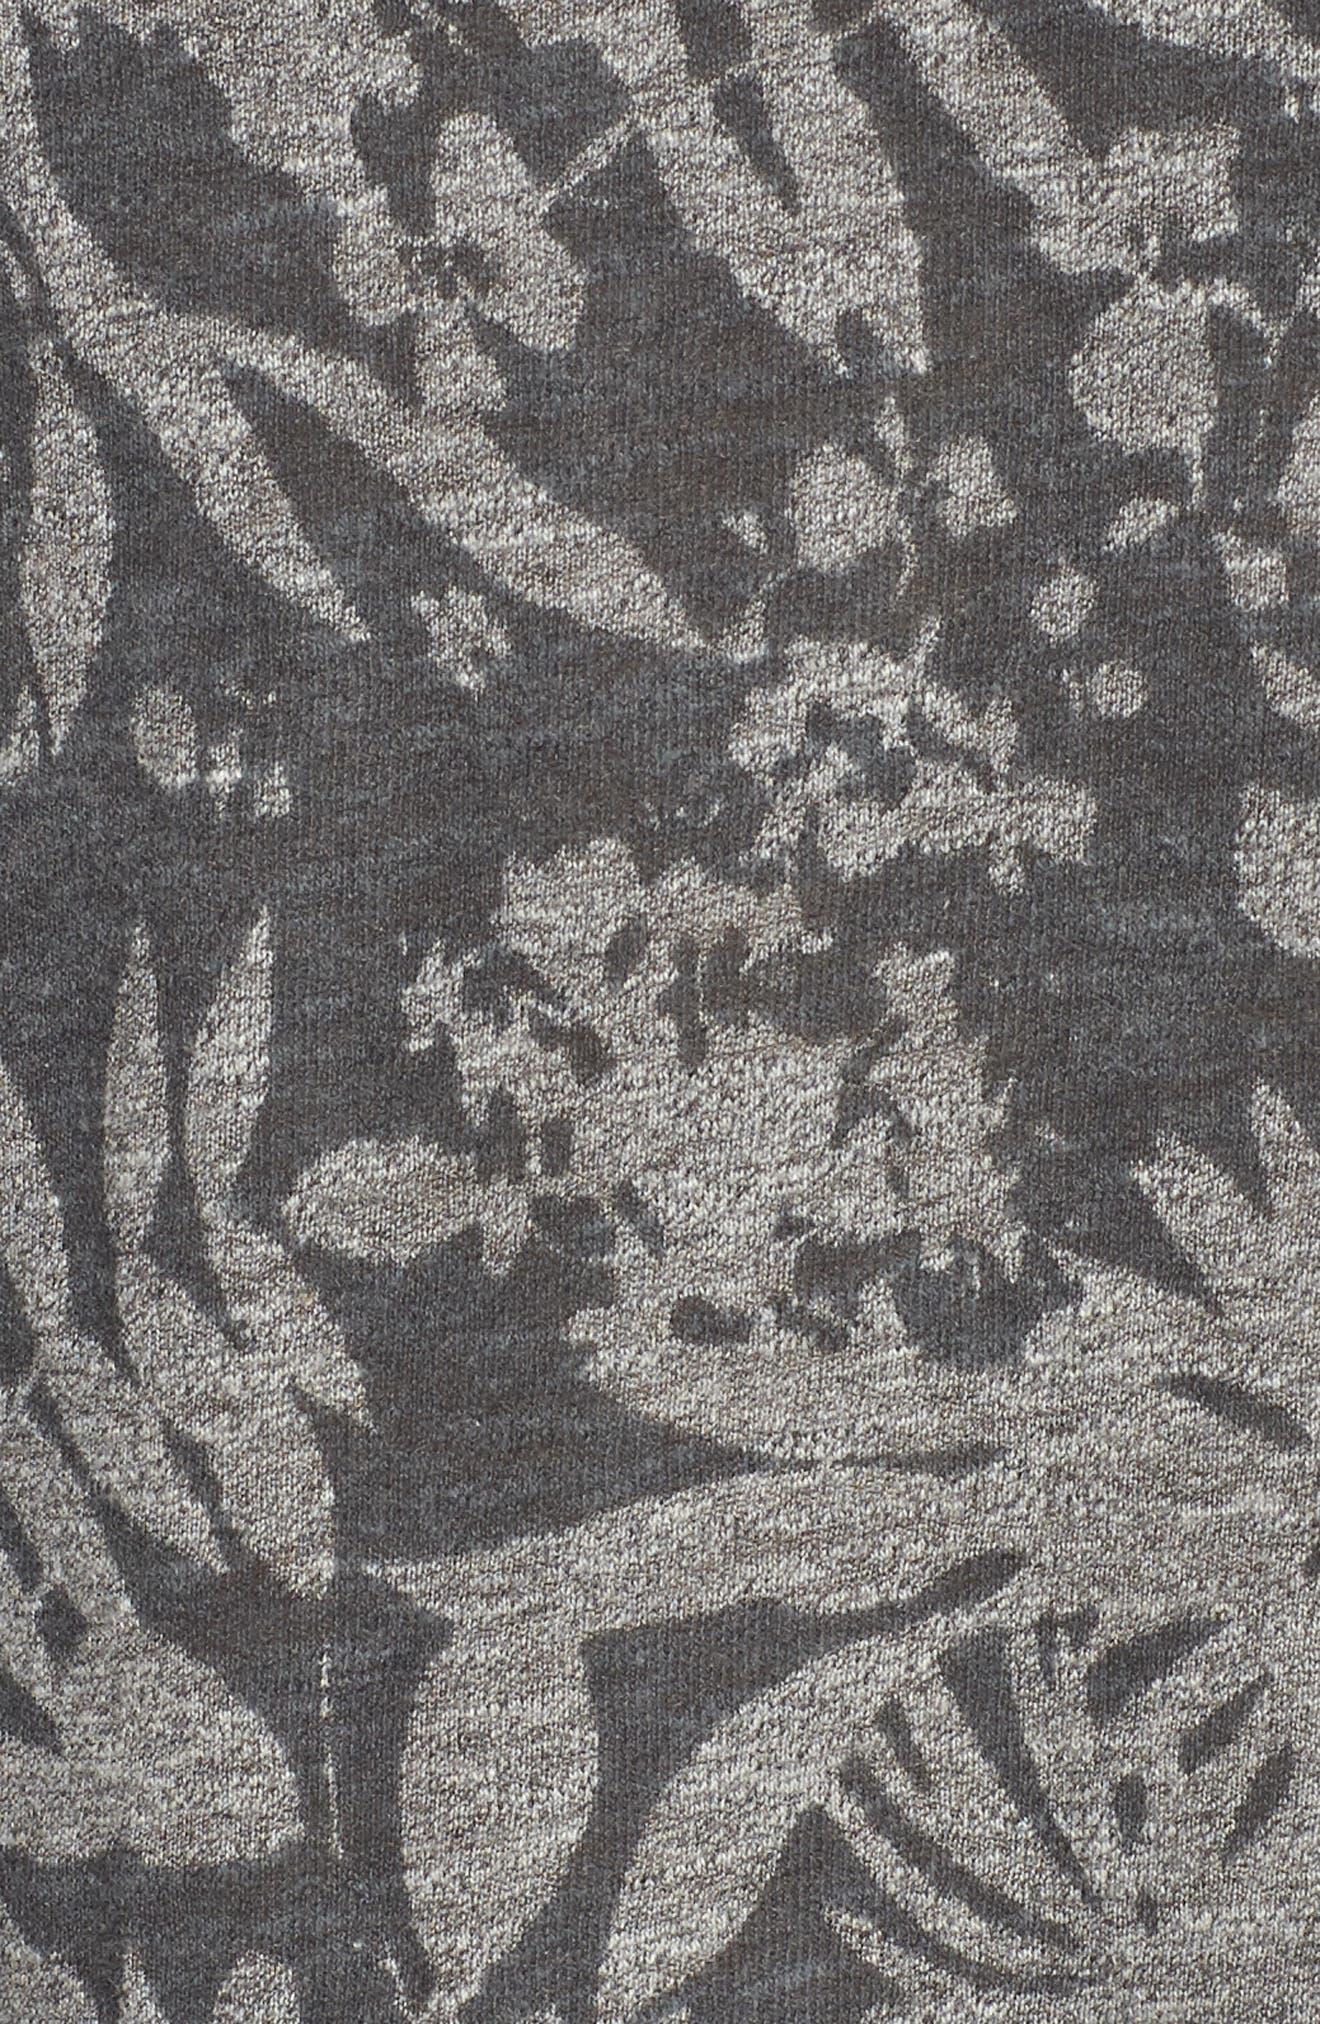 Floral Print Tank,                             Alternate thumbnail 6, color,                             Heather Grey